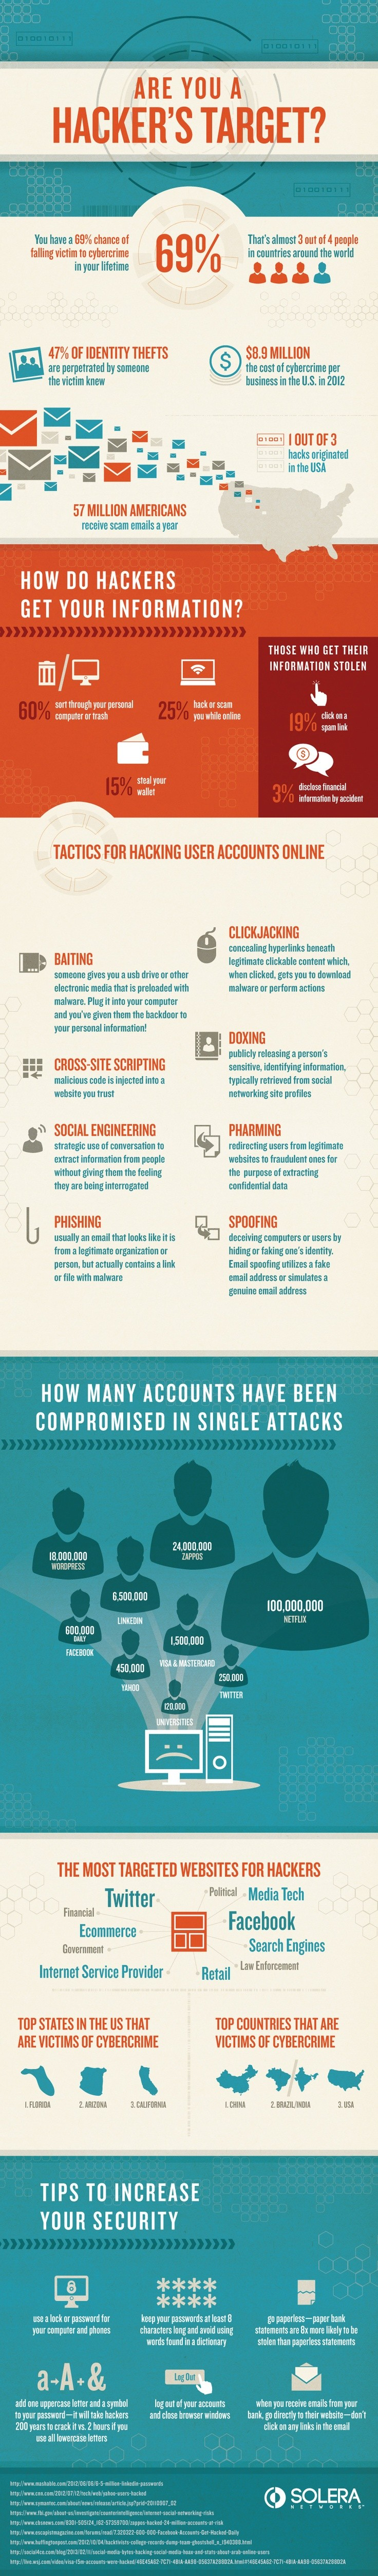 Cybercrime Transformed By Modern Computing